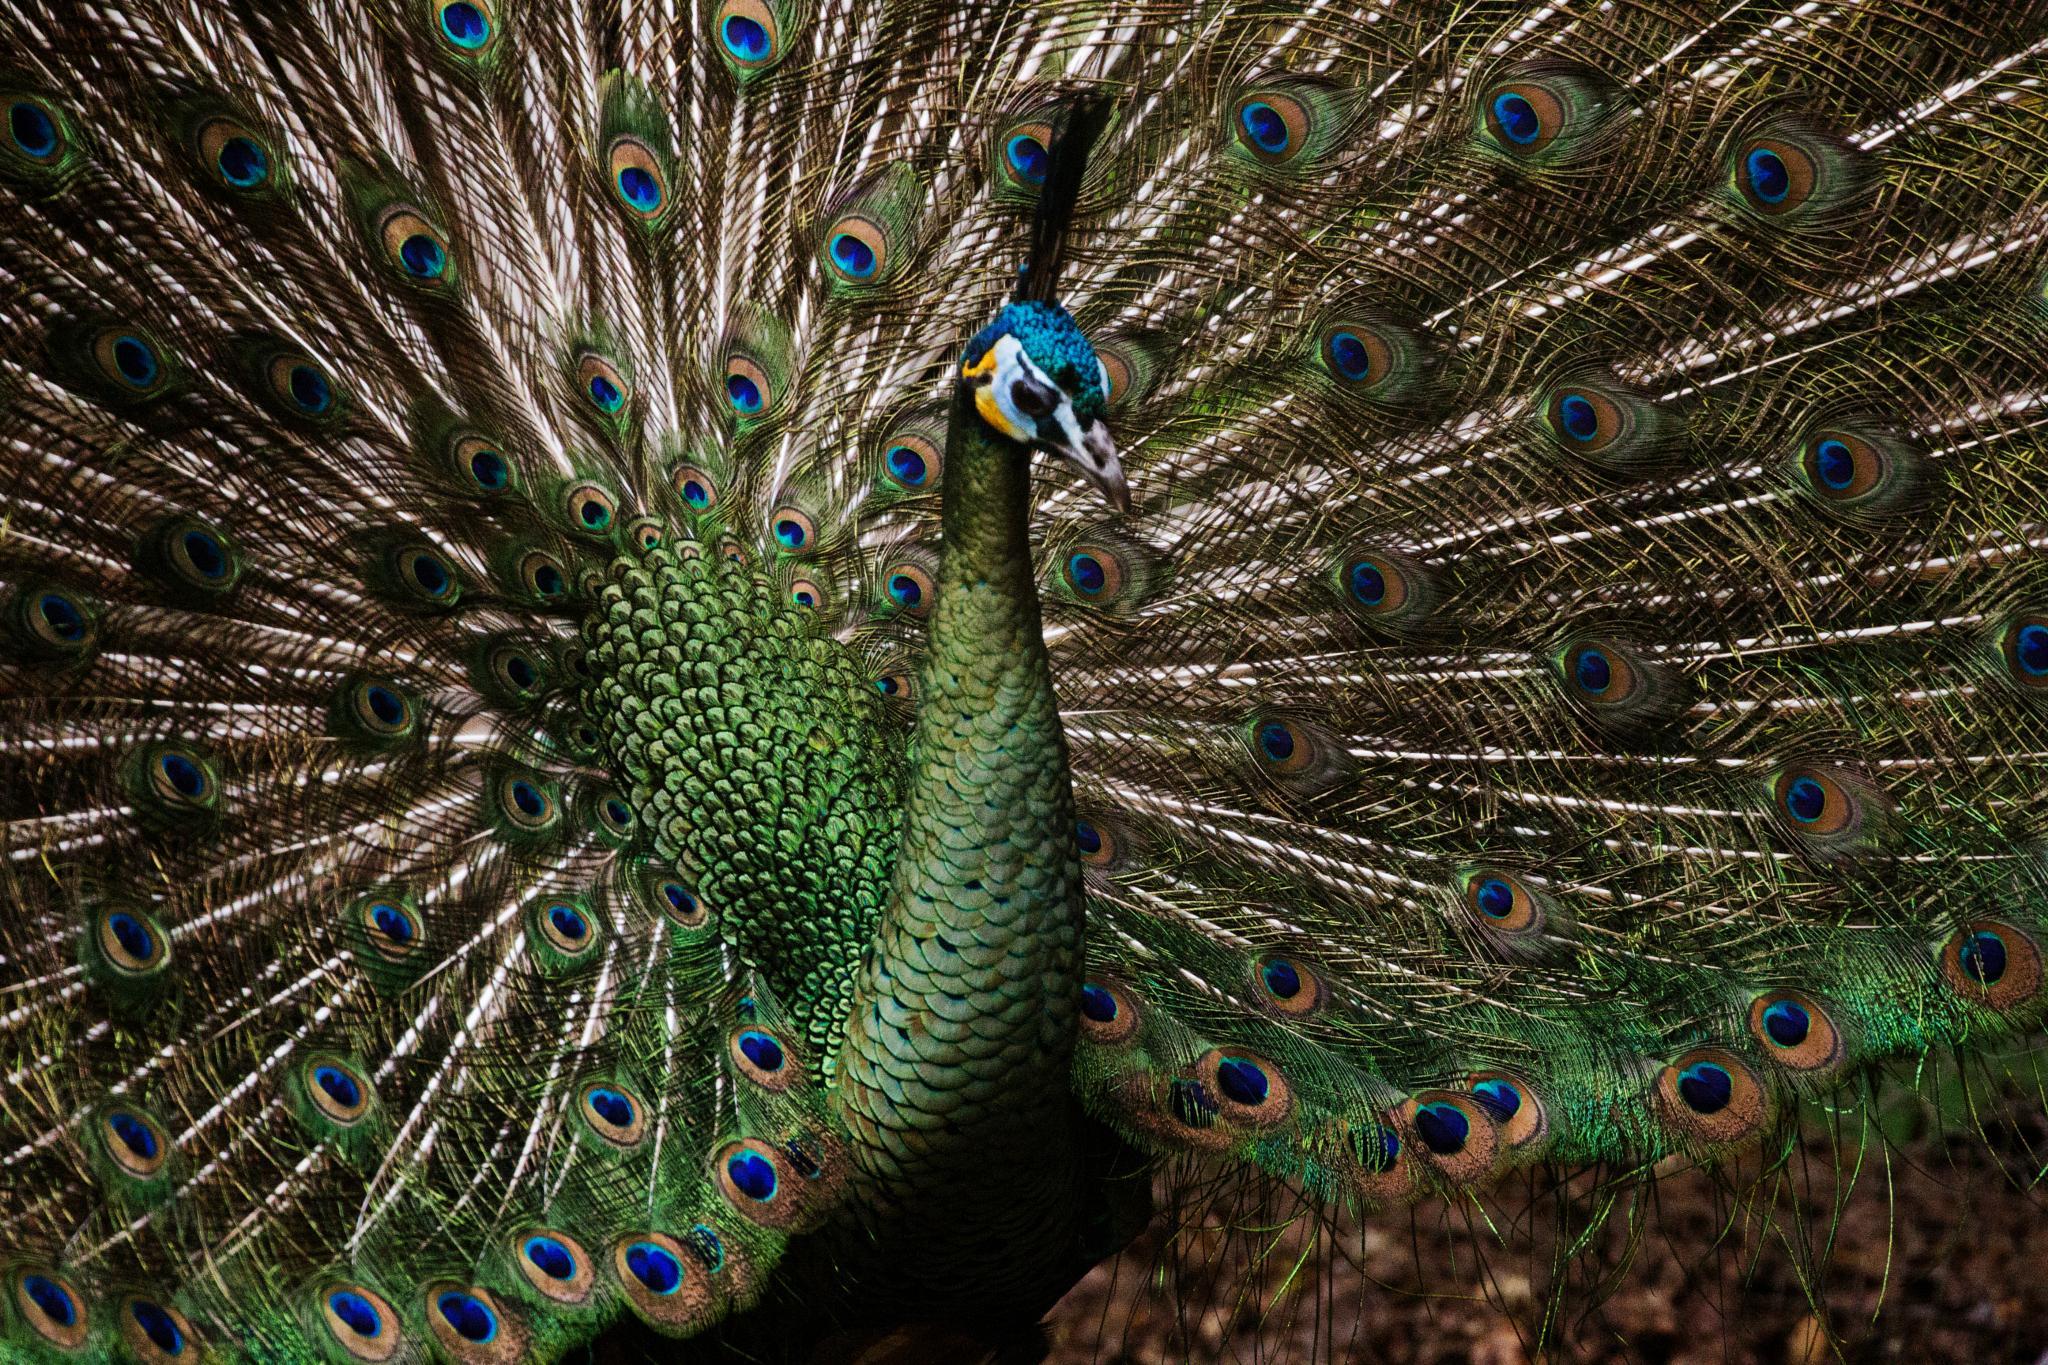 Green Peacock by Nikki Wilson